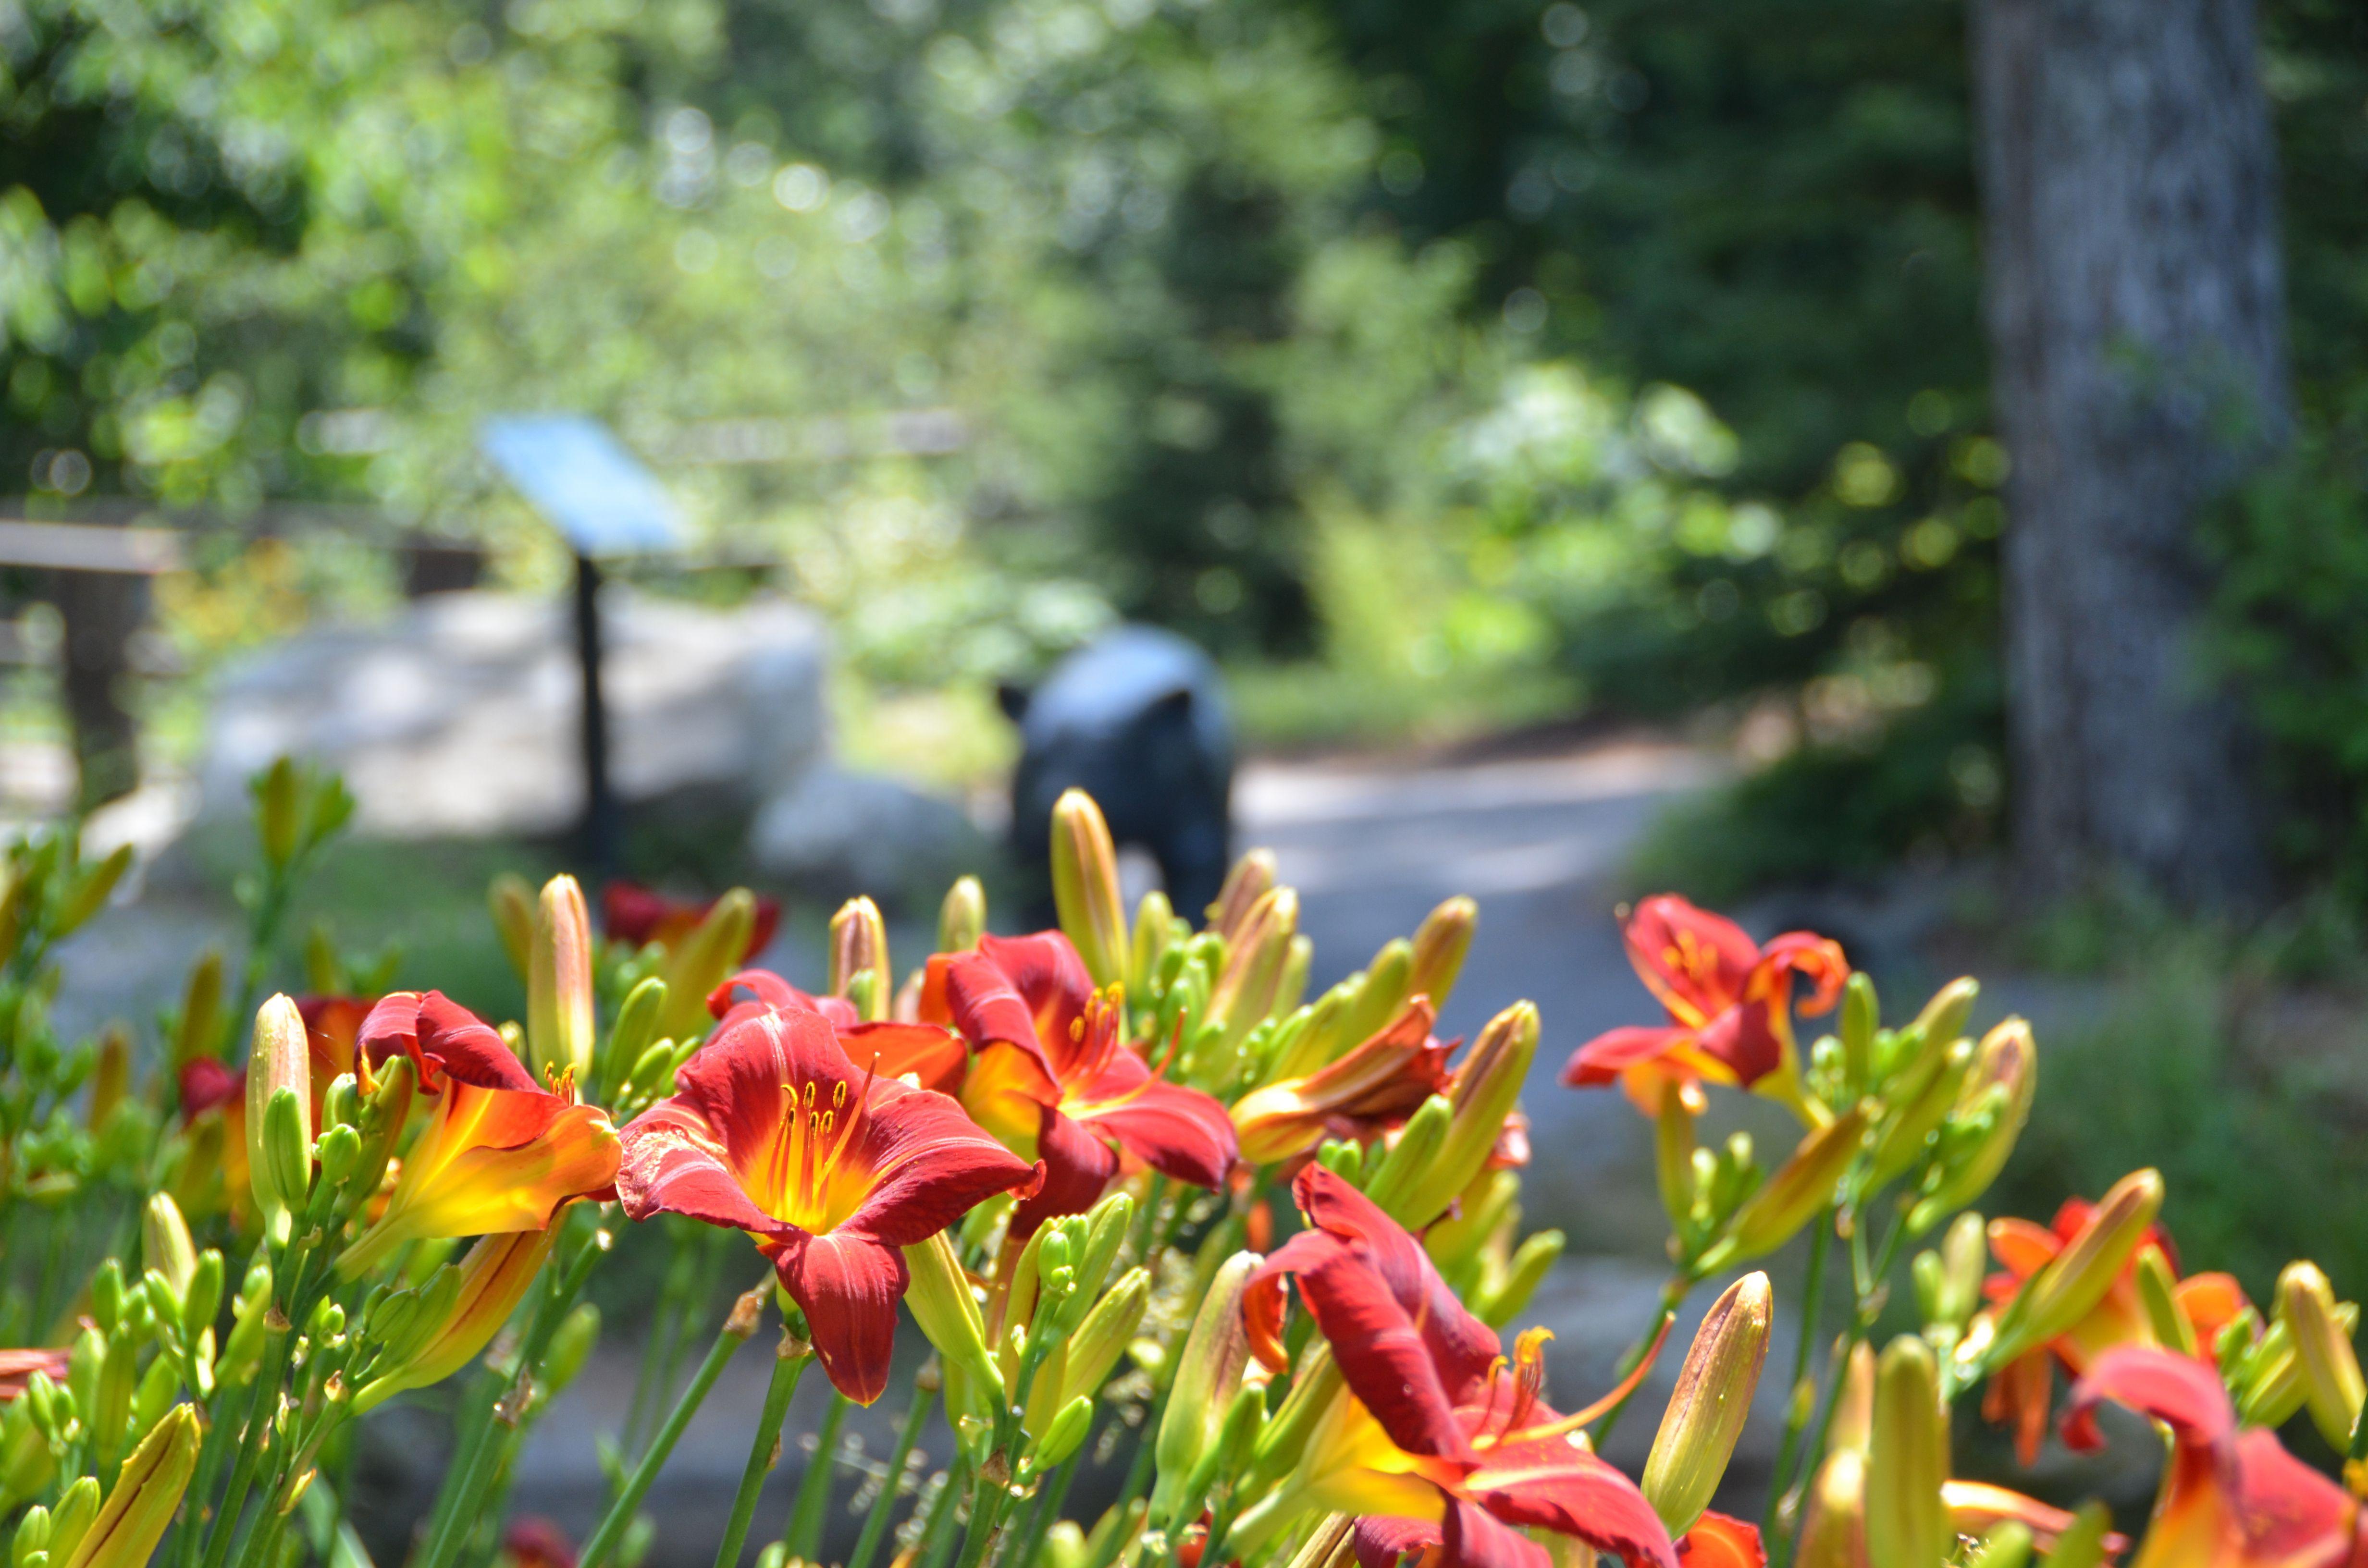 Hemerocallis 'Baja' daylilies overlooking Blueberry Pond at Coastal Maine Botanical Gardens.